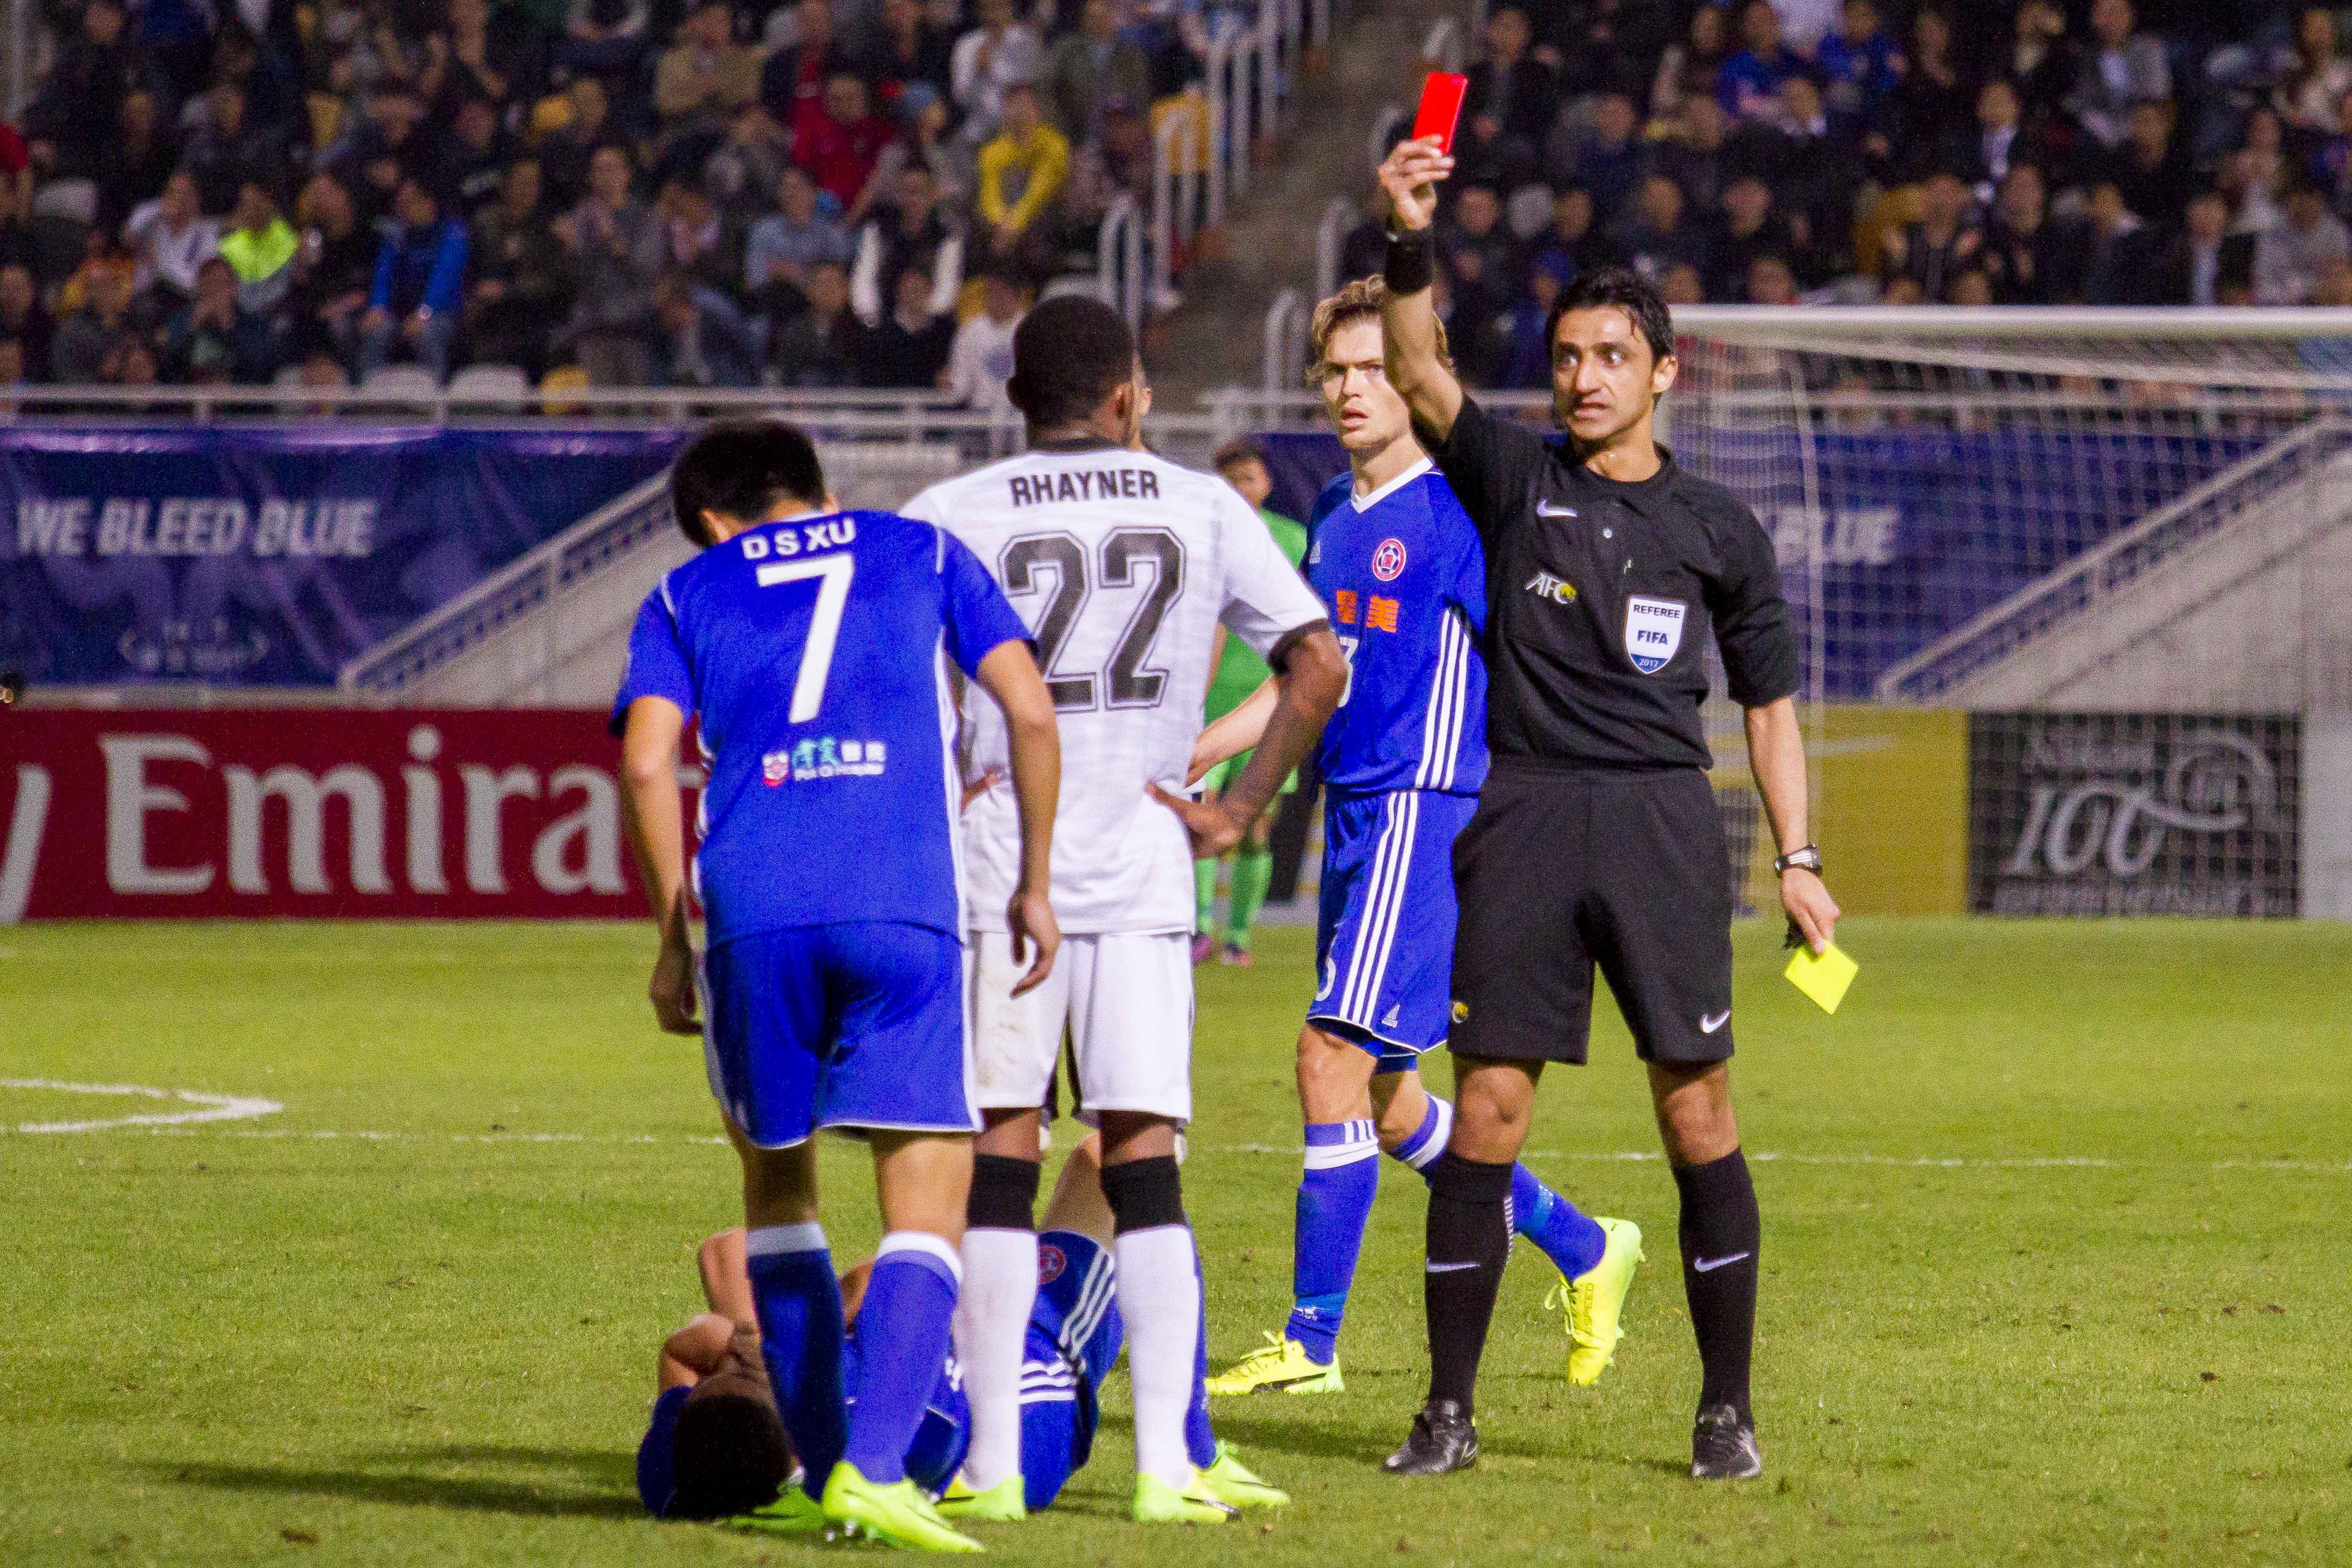 Referee Mohanad Qasim Eesee Sarray shows Rhayner of Kawasaki Frontale (JPN) a red card during the ACL Asian Champions League match between Eastern SC and Kawasaki Frontale at Mongkok Stadium